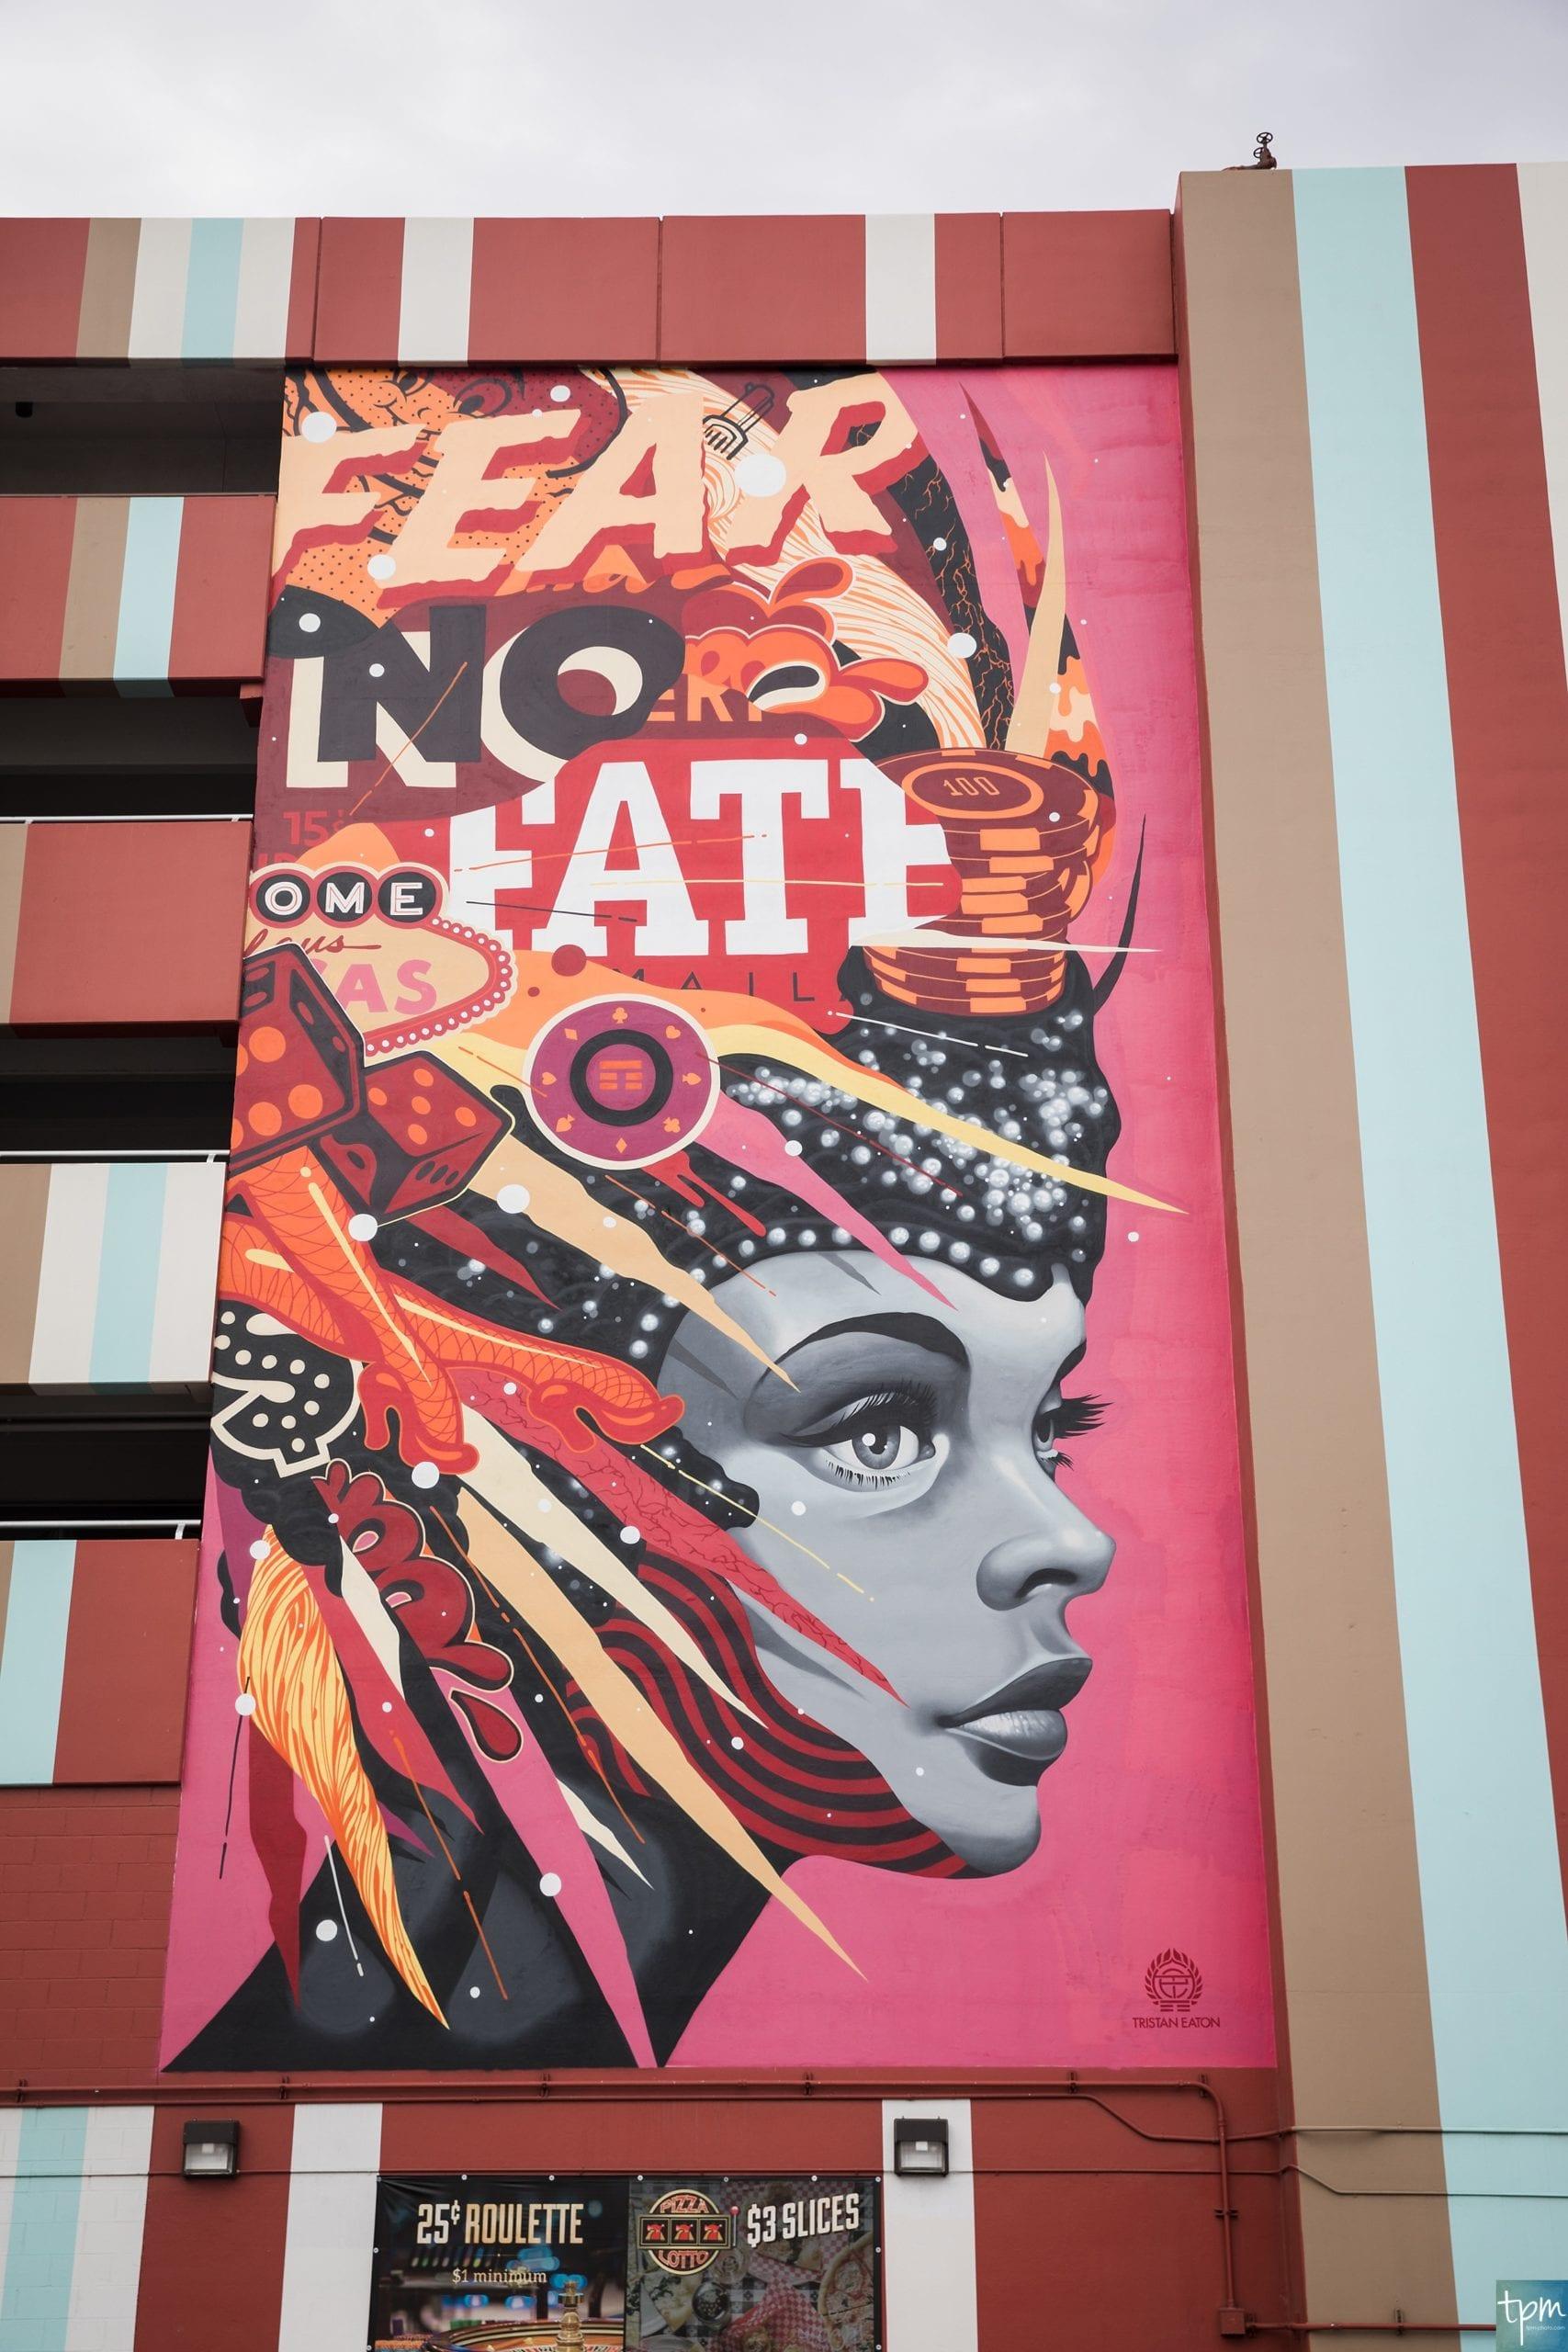 Tristan Eaton, Fear no Fate, Taylored Photo Memories, Las Vegas Murals